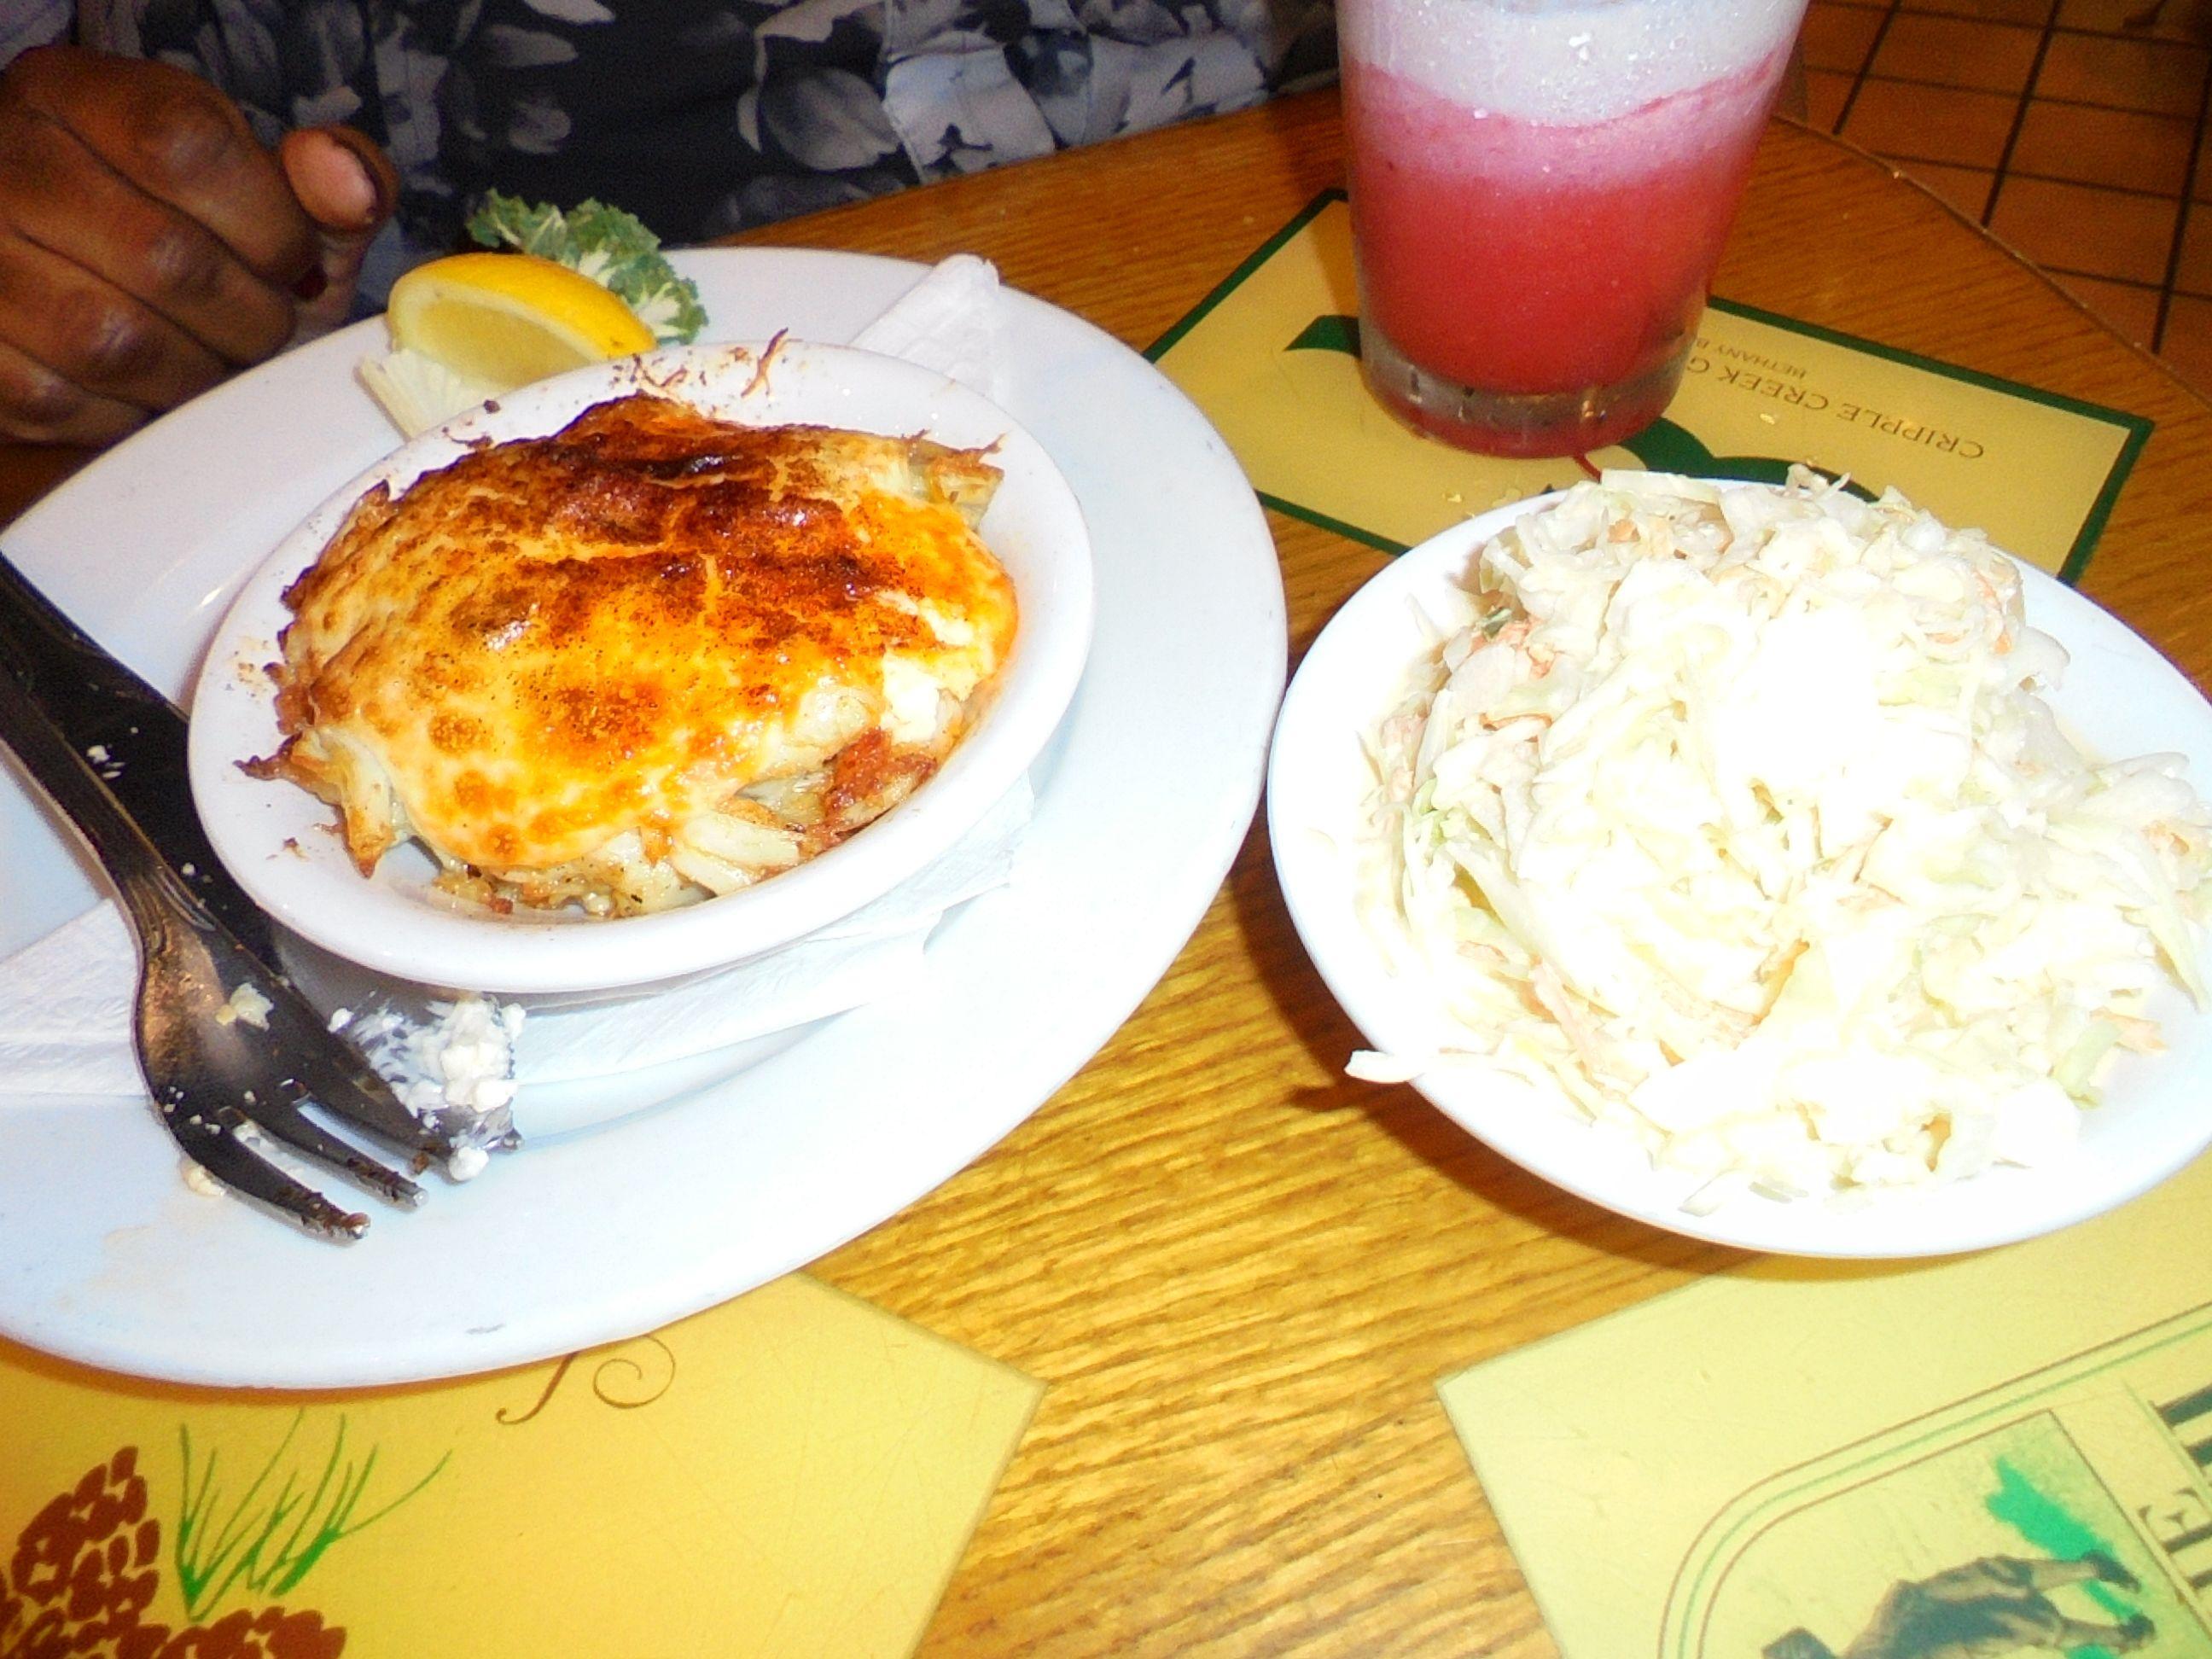 #ImperialLumpCrab #meal @ #JakesSeafoodRehobothDelaware #RehobothBeach - http://www.drewrynewsnetwork.com